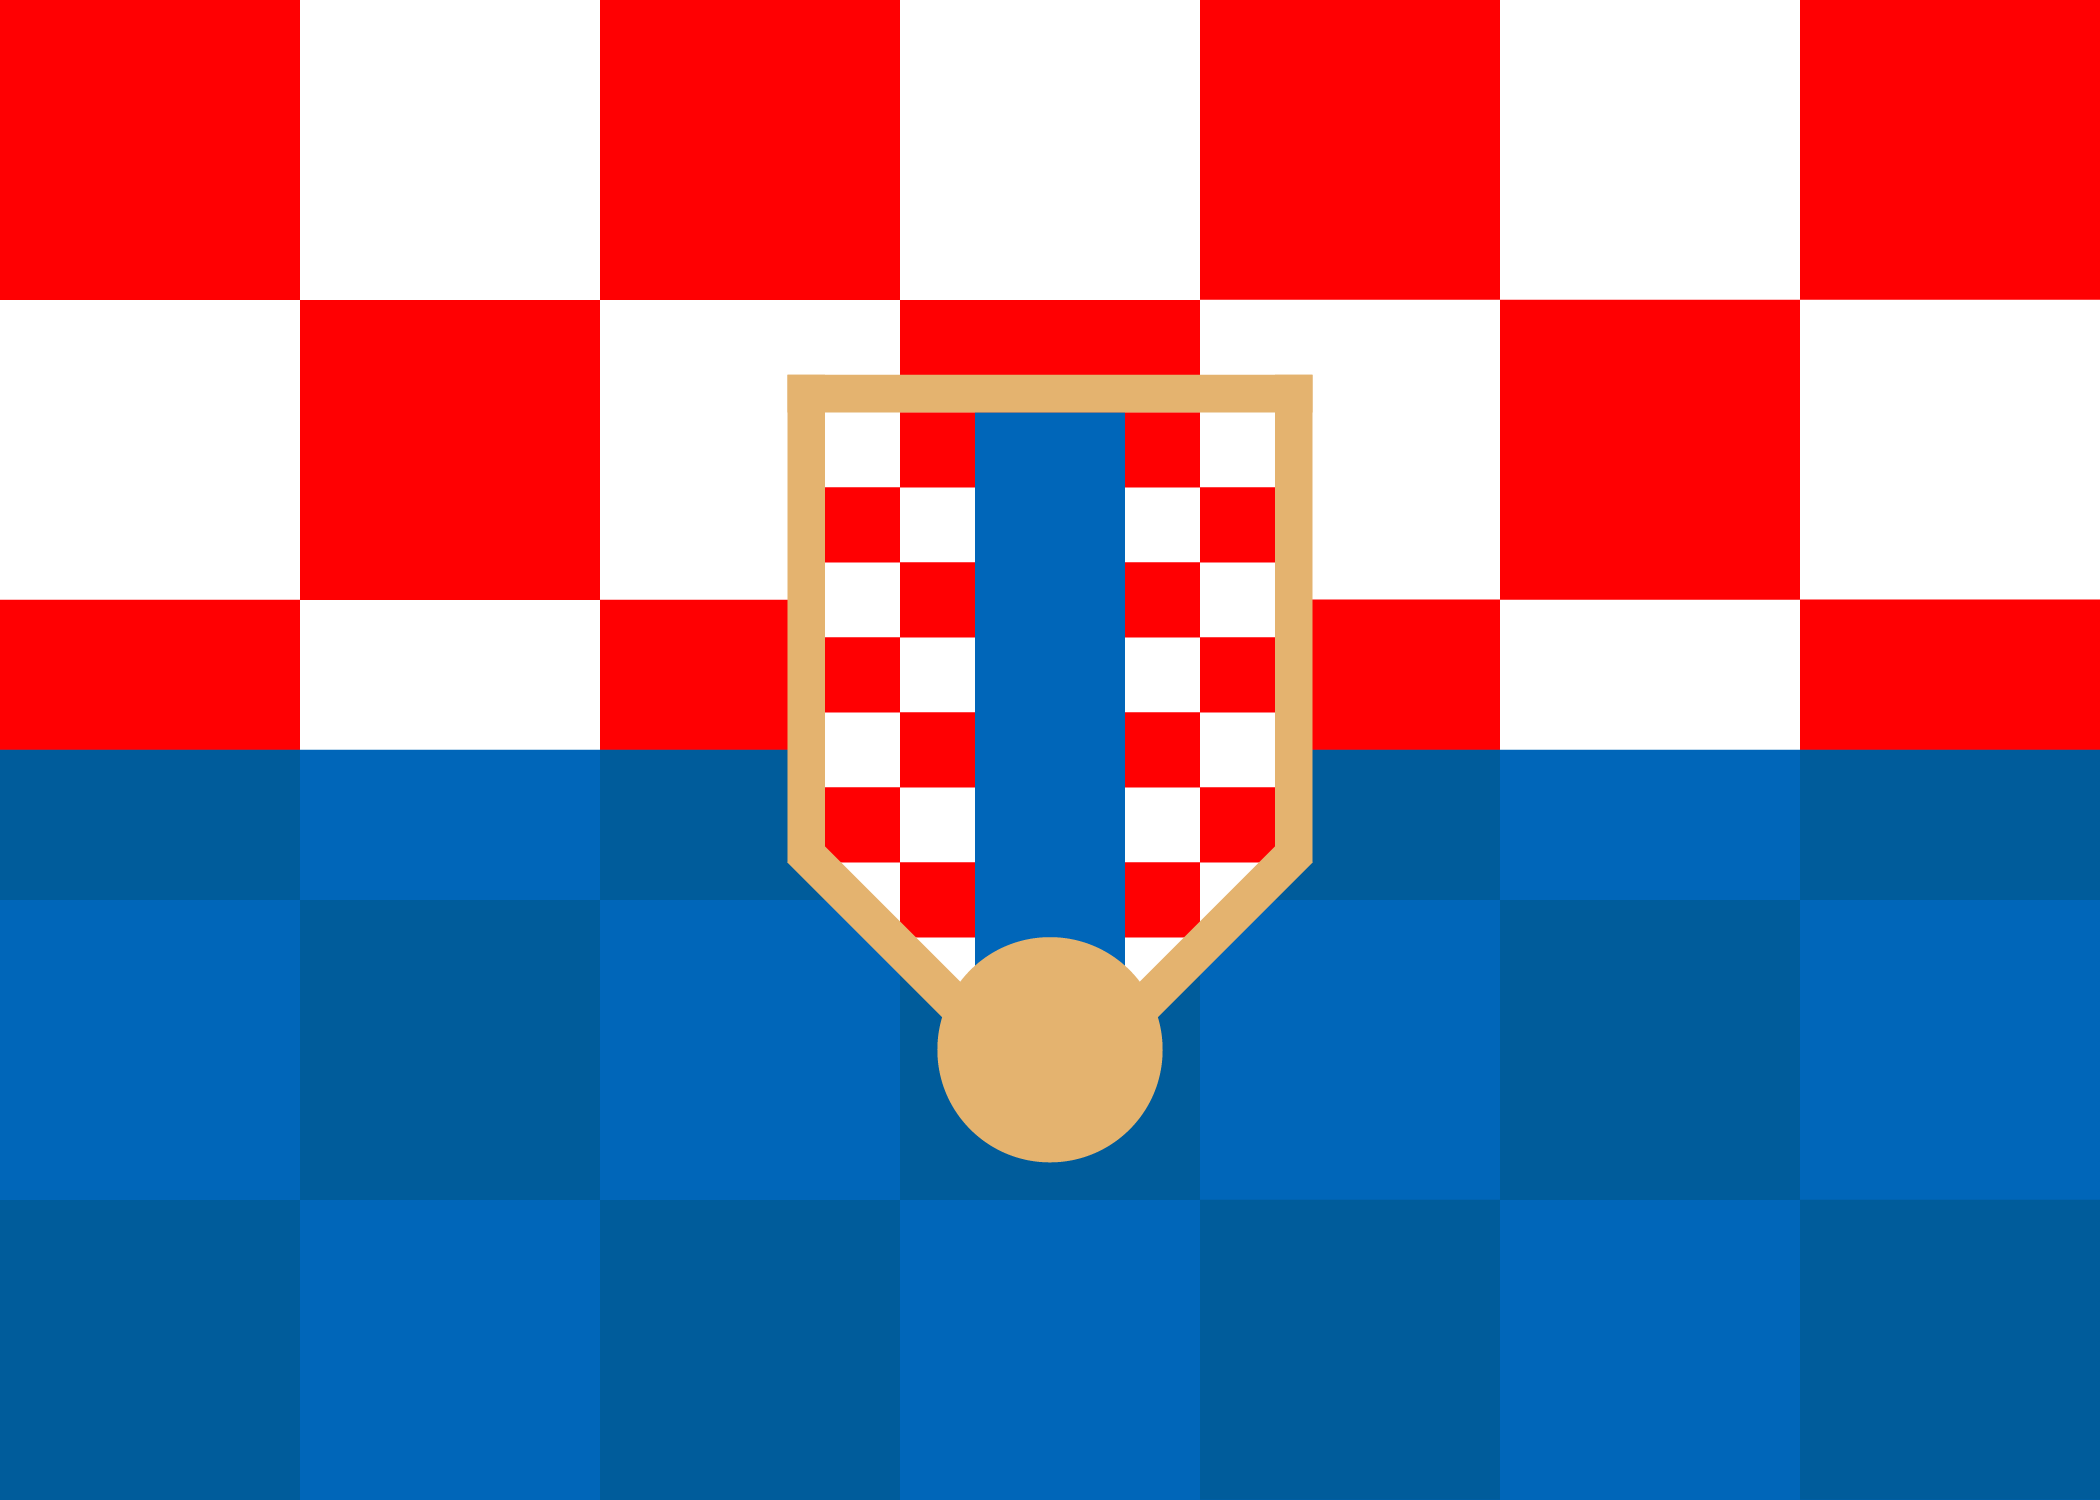 Croatia-Geometric-World-Cup-Football-Badge-01-Logo-Design-Freelance-Kent.png